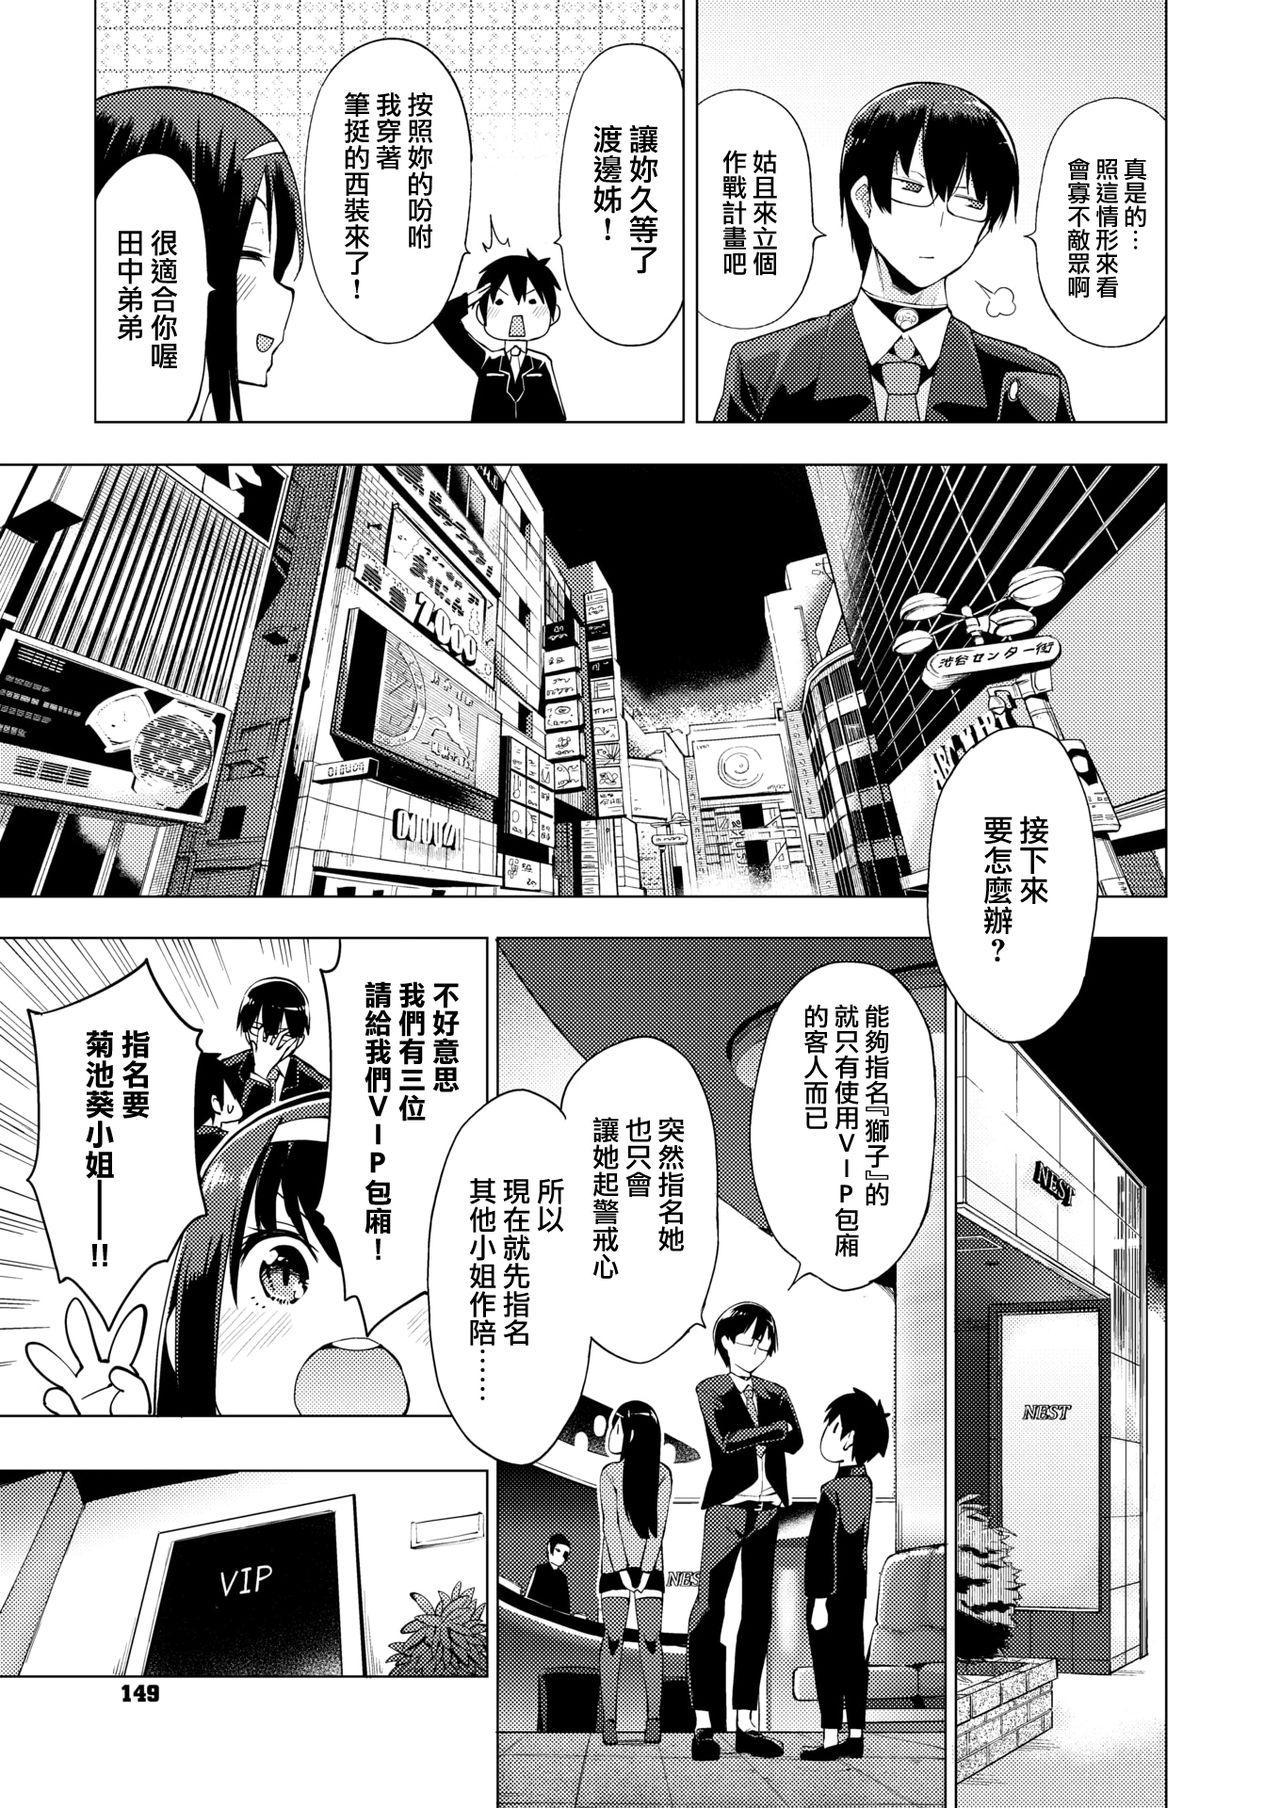 [Kenji] Karigogo ~Nikuyoku Shoujo~ #3 [Chinese] [就變態翻譯組一人樣 x 我尻故我在個人漢化#21] [Digital] 4